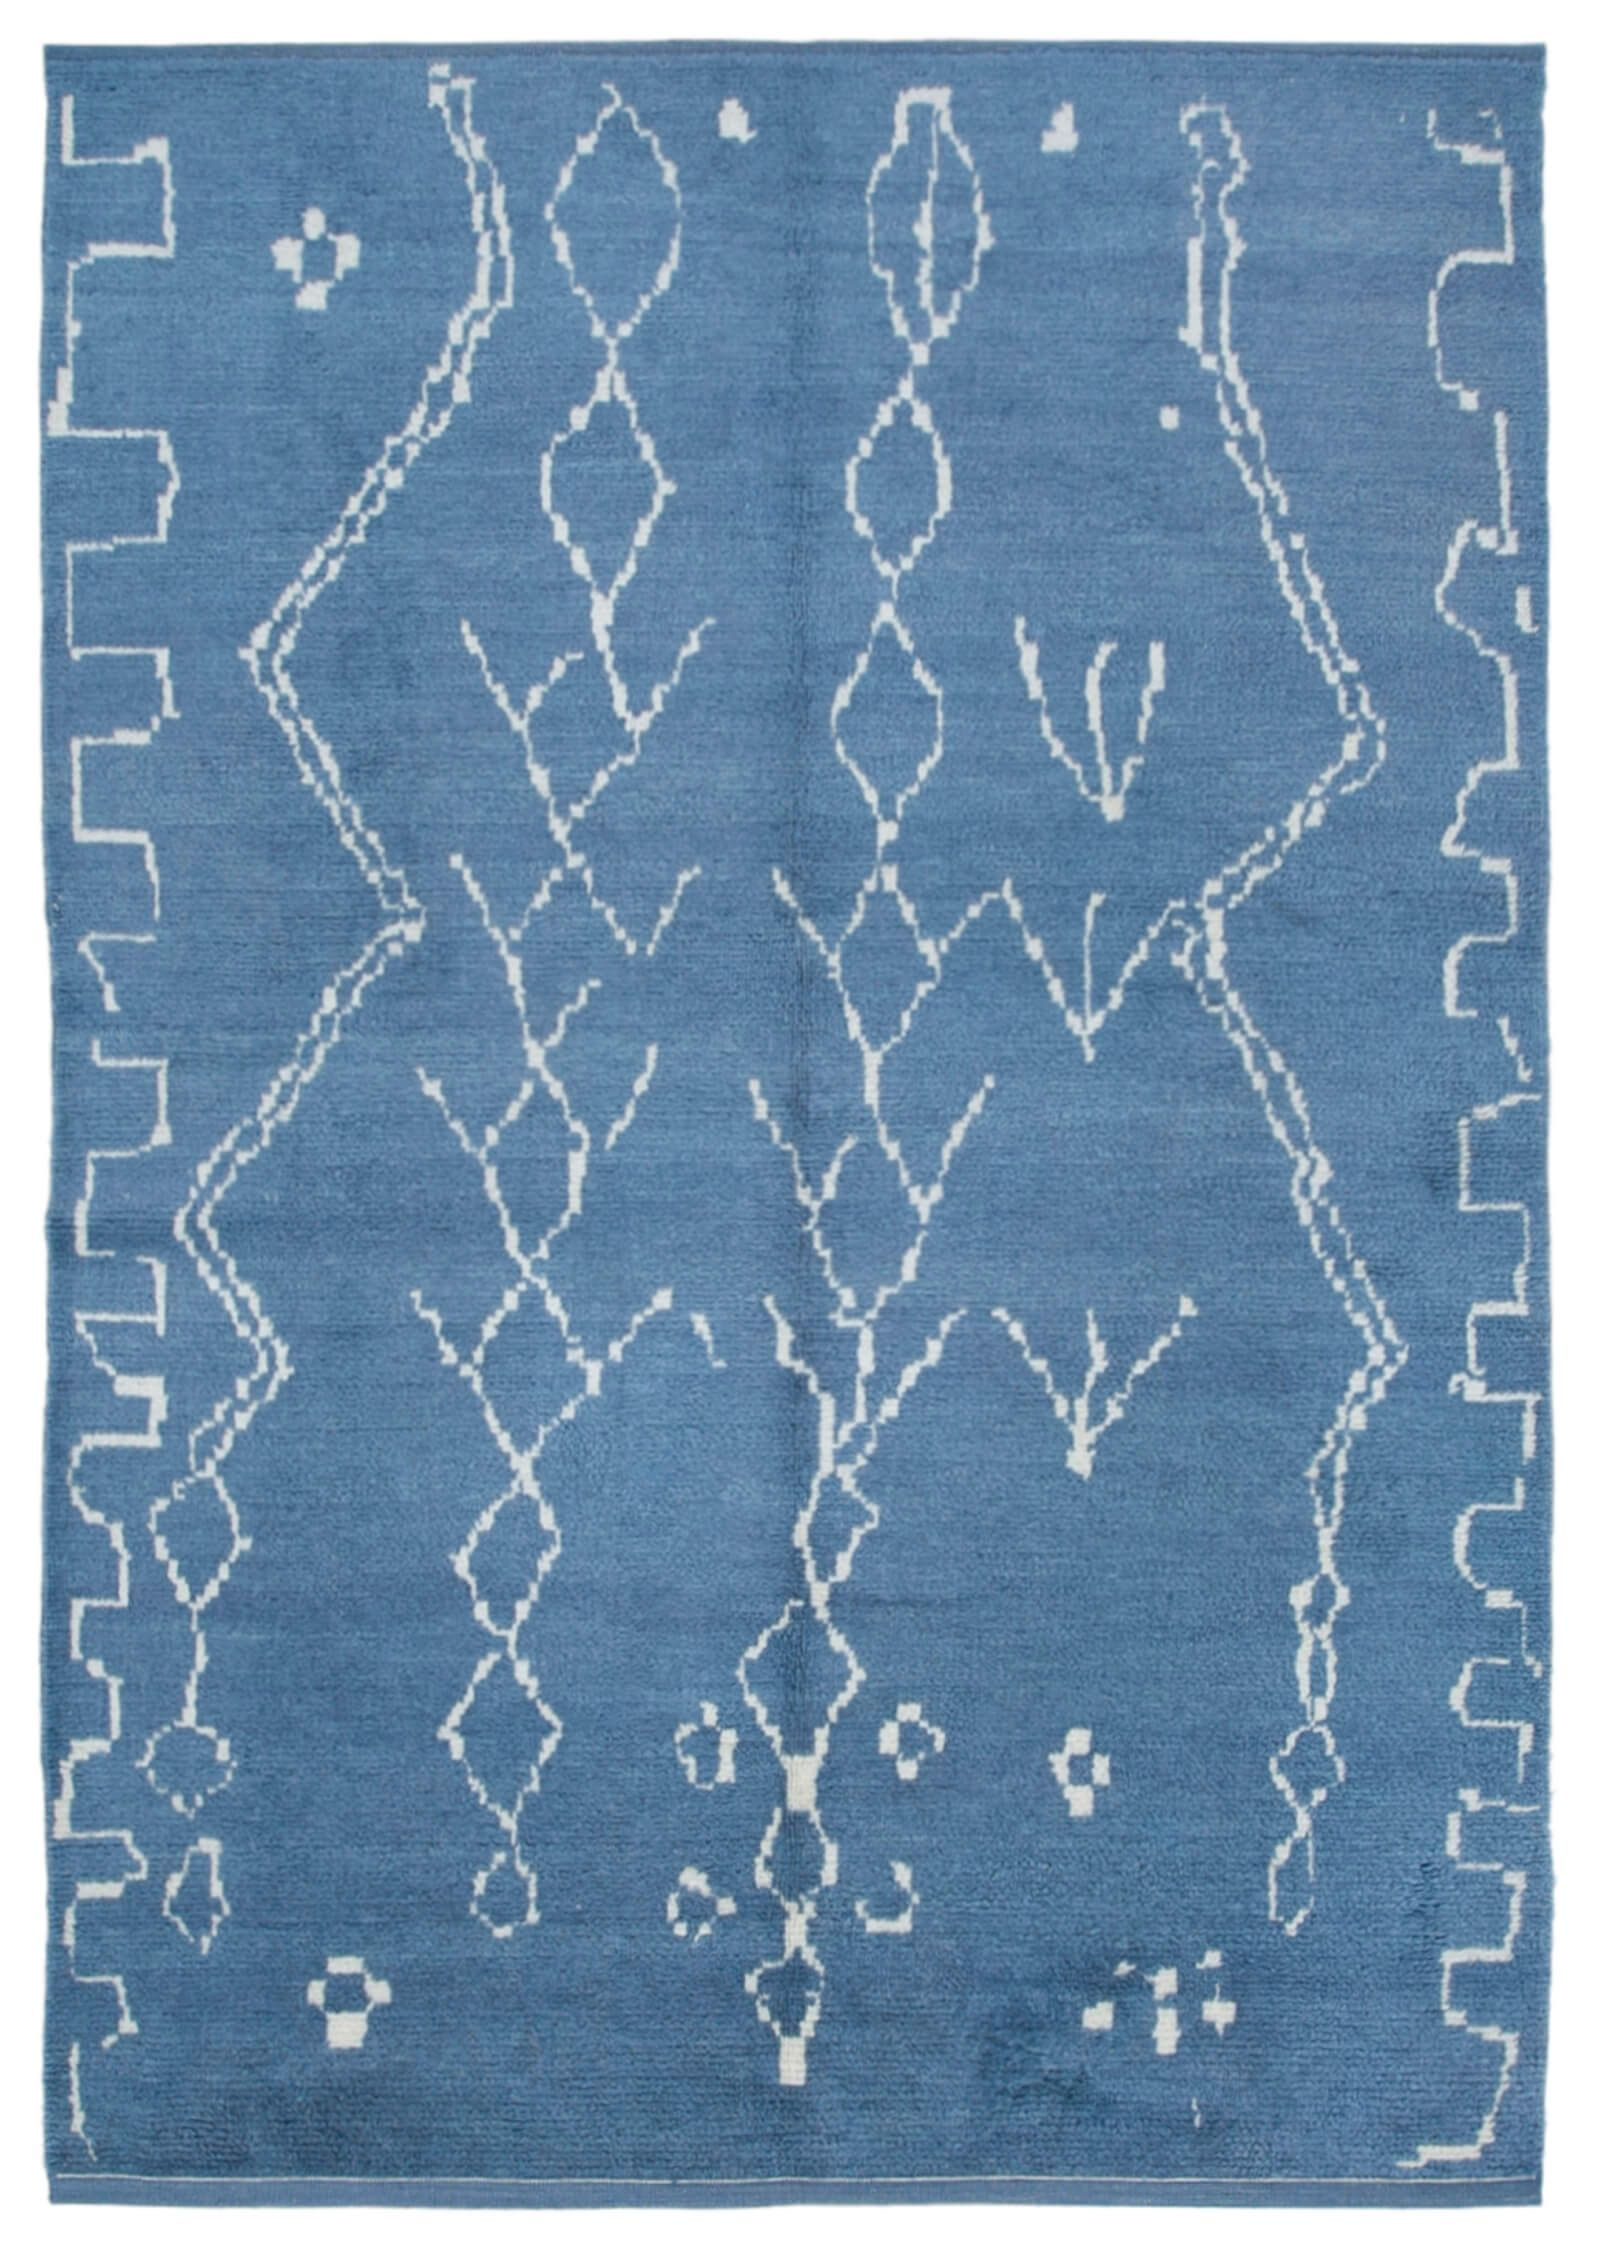 7x10 Blue Morocco Rug 10877 Wool Area Rugs Dark Blue Rug Minimalist Rugs